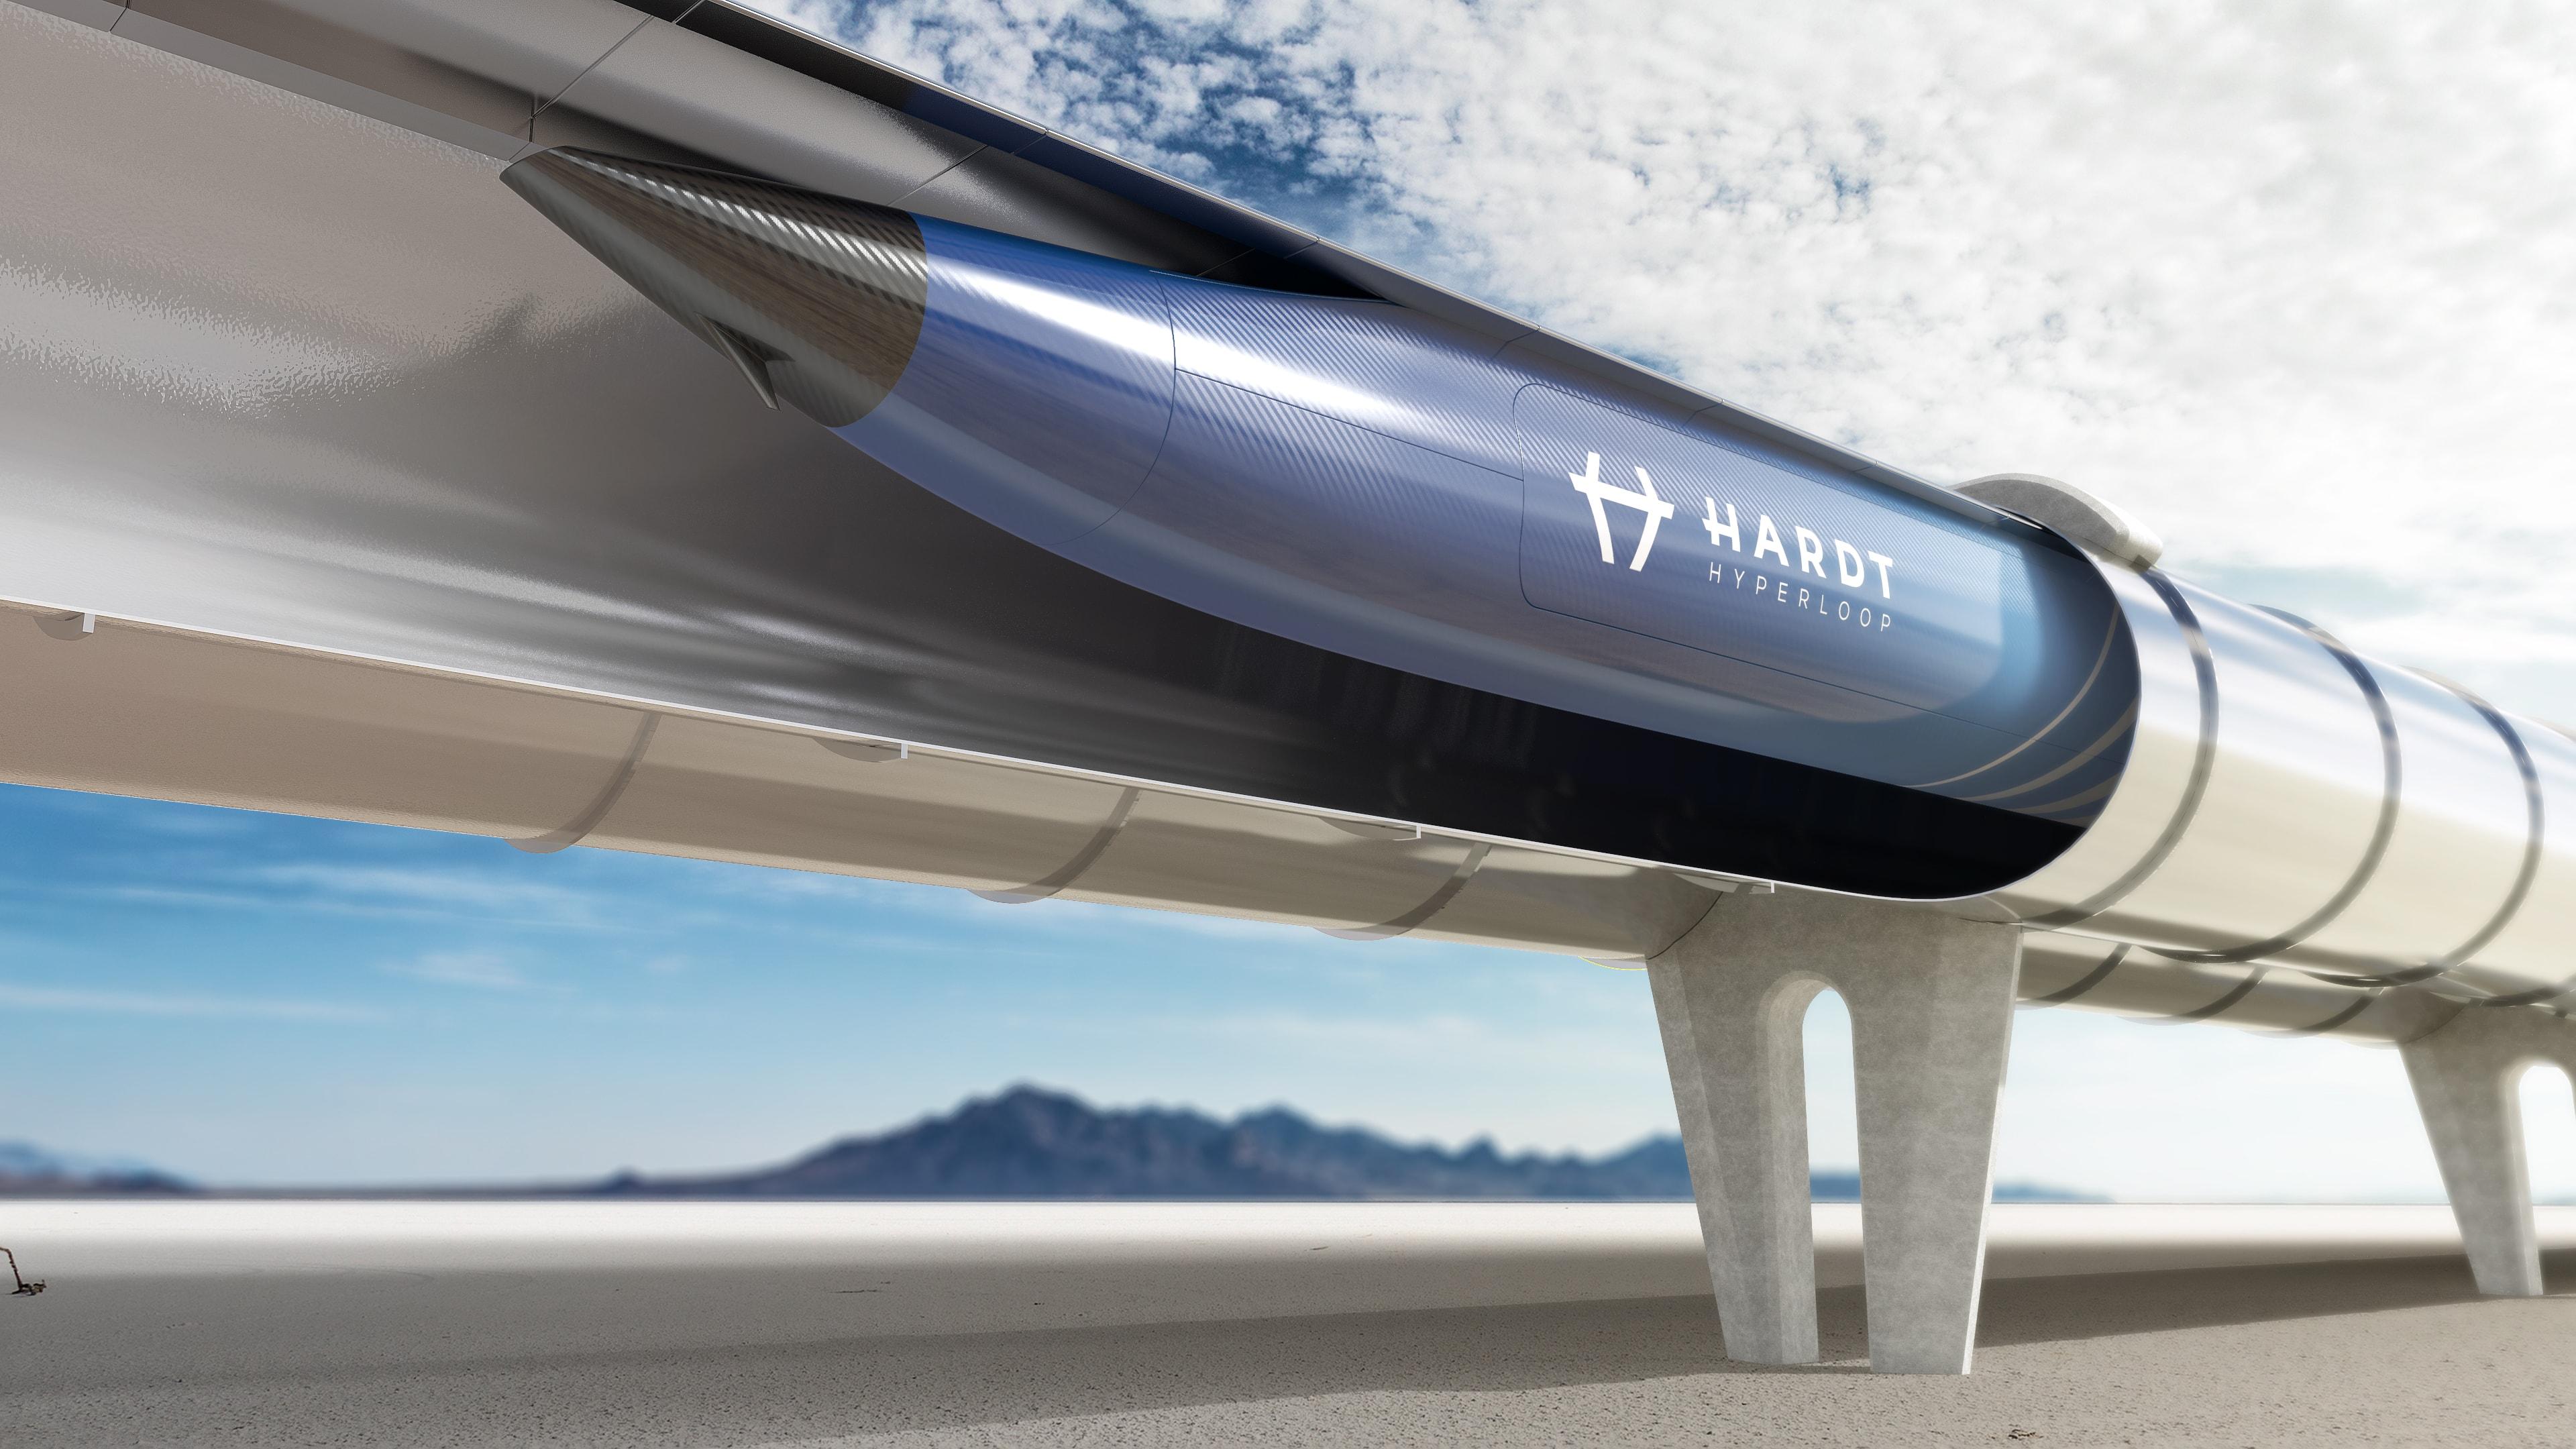 Hardt_hyperloop_vehicle_render LR